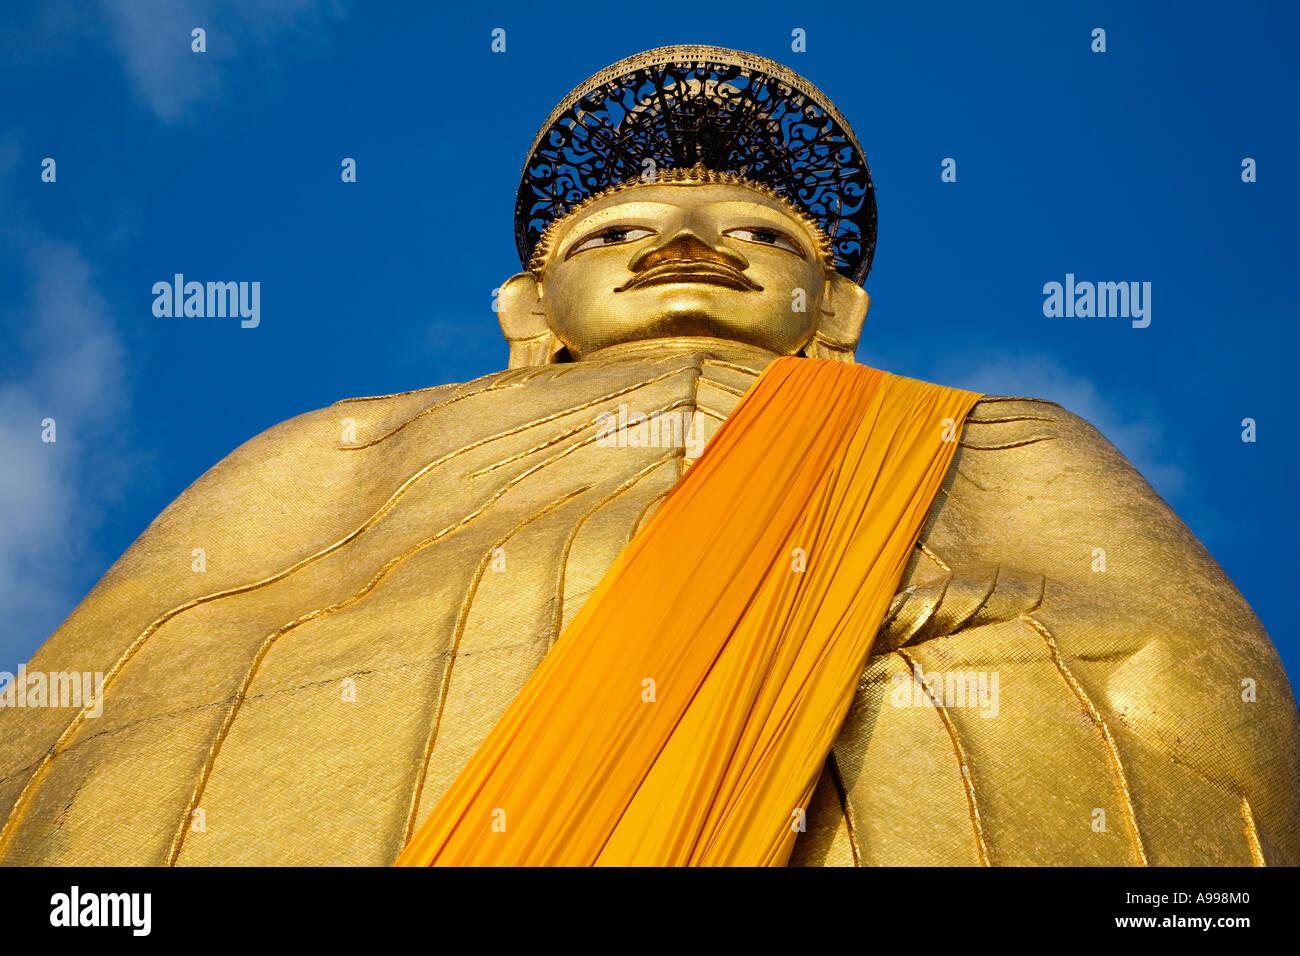 Luang Pho To is a huge 32 metre high standing buddha at Wat Intharawihan in Bangkok, Thailand. - Stock Image